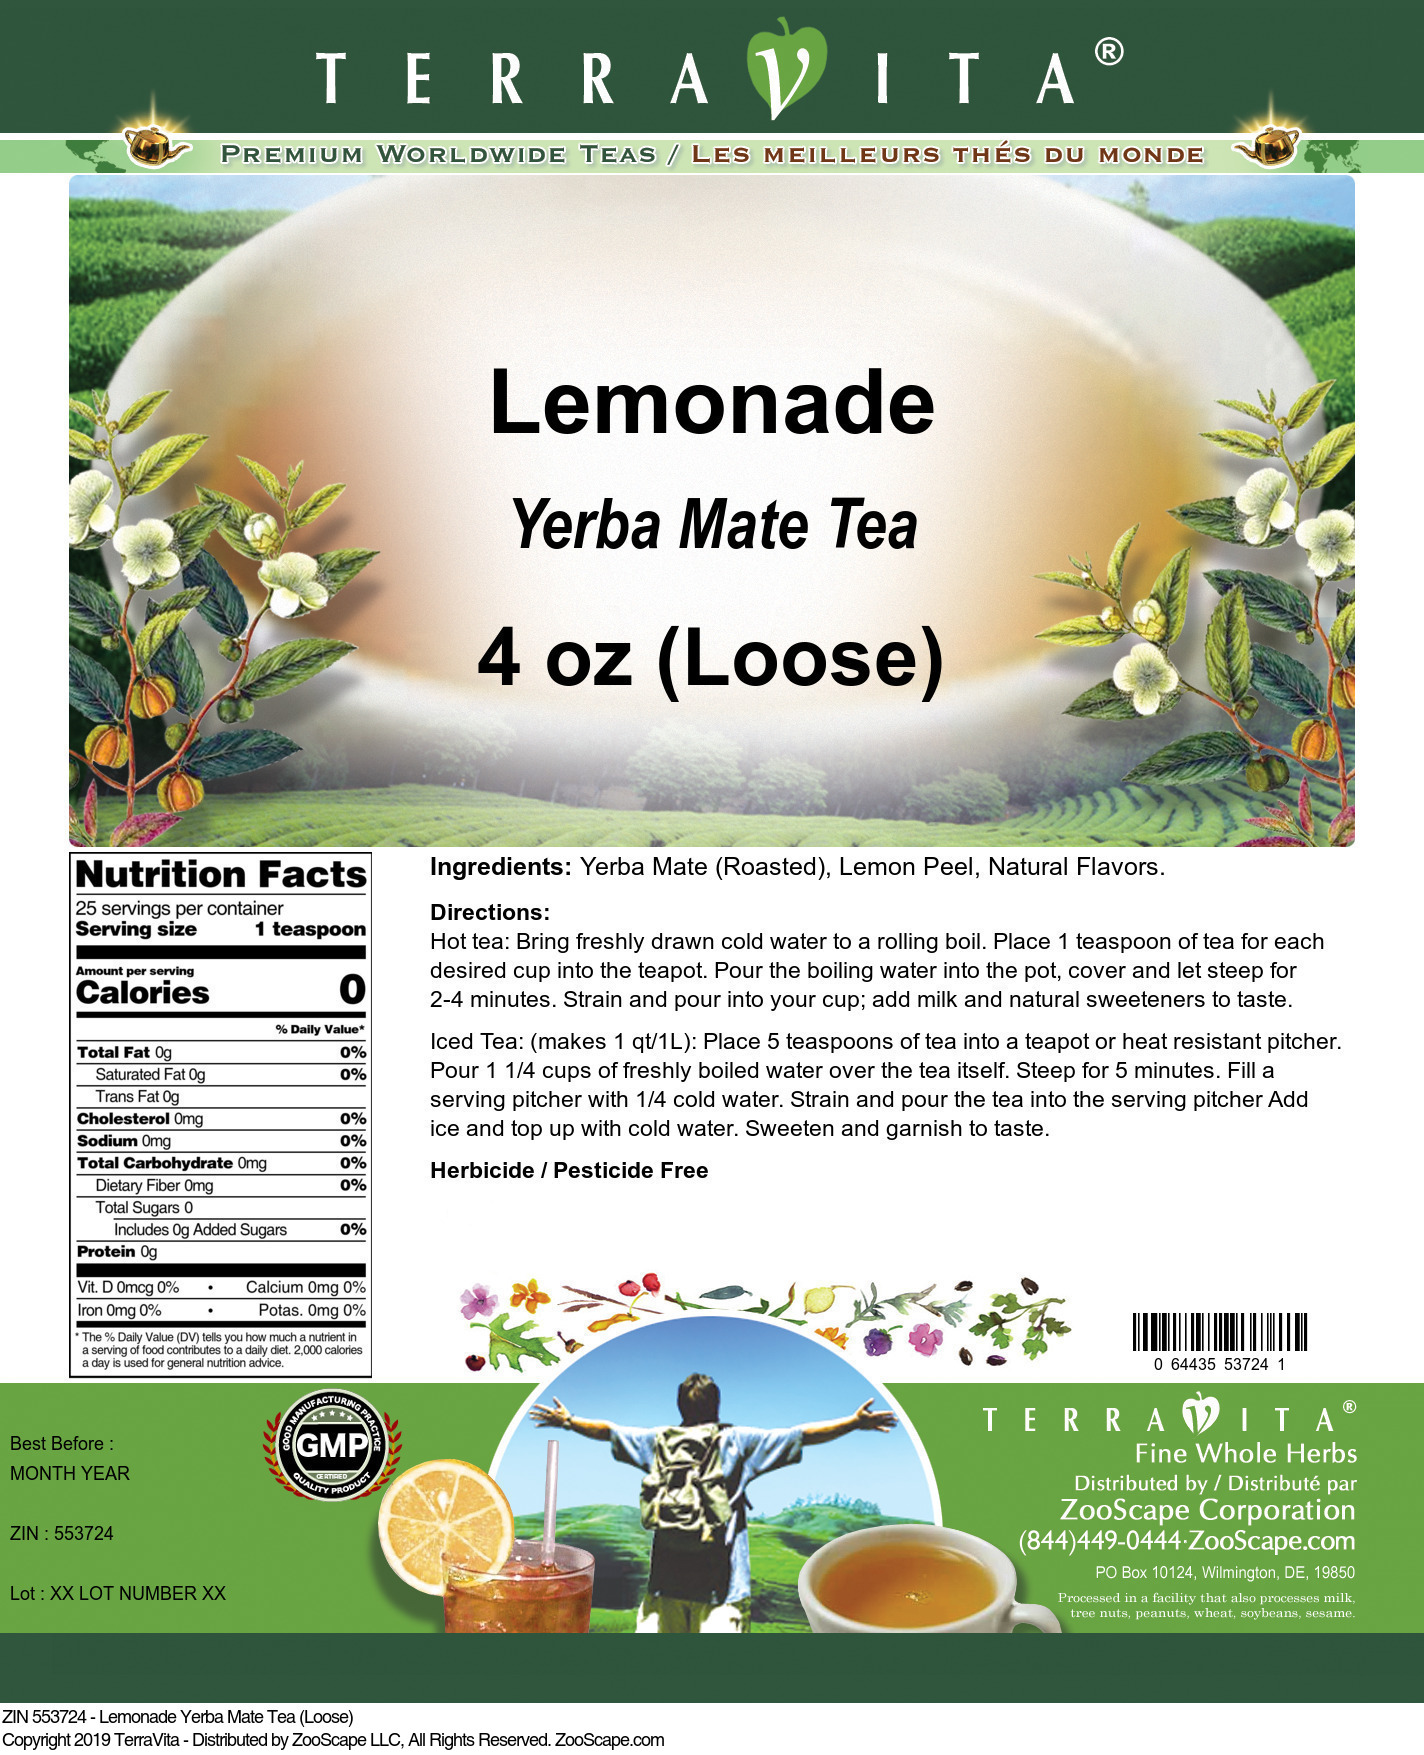 Lemonade Yerba Mate Tea (Loose)